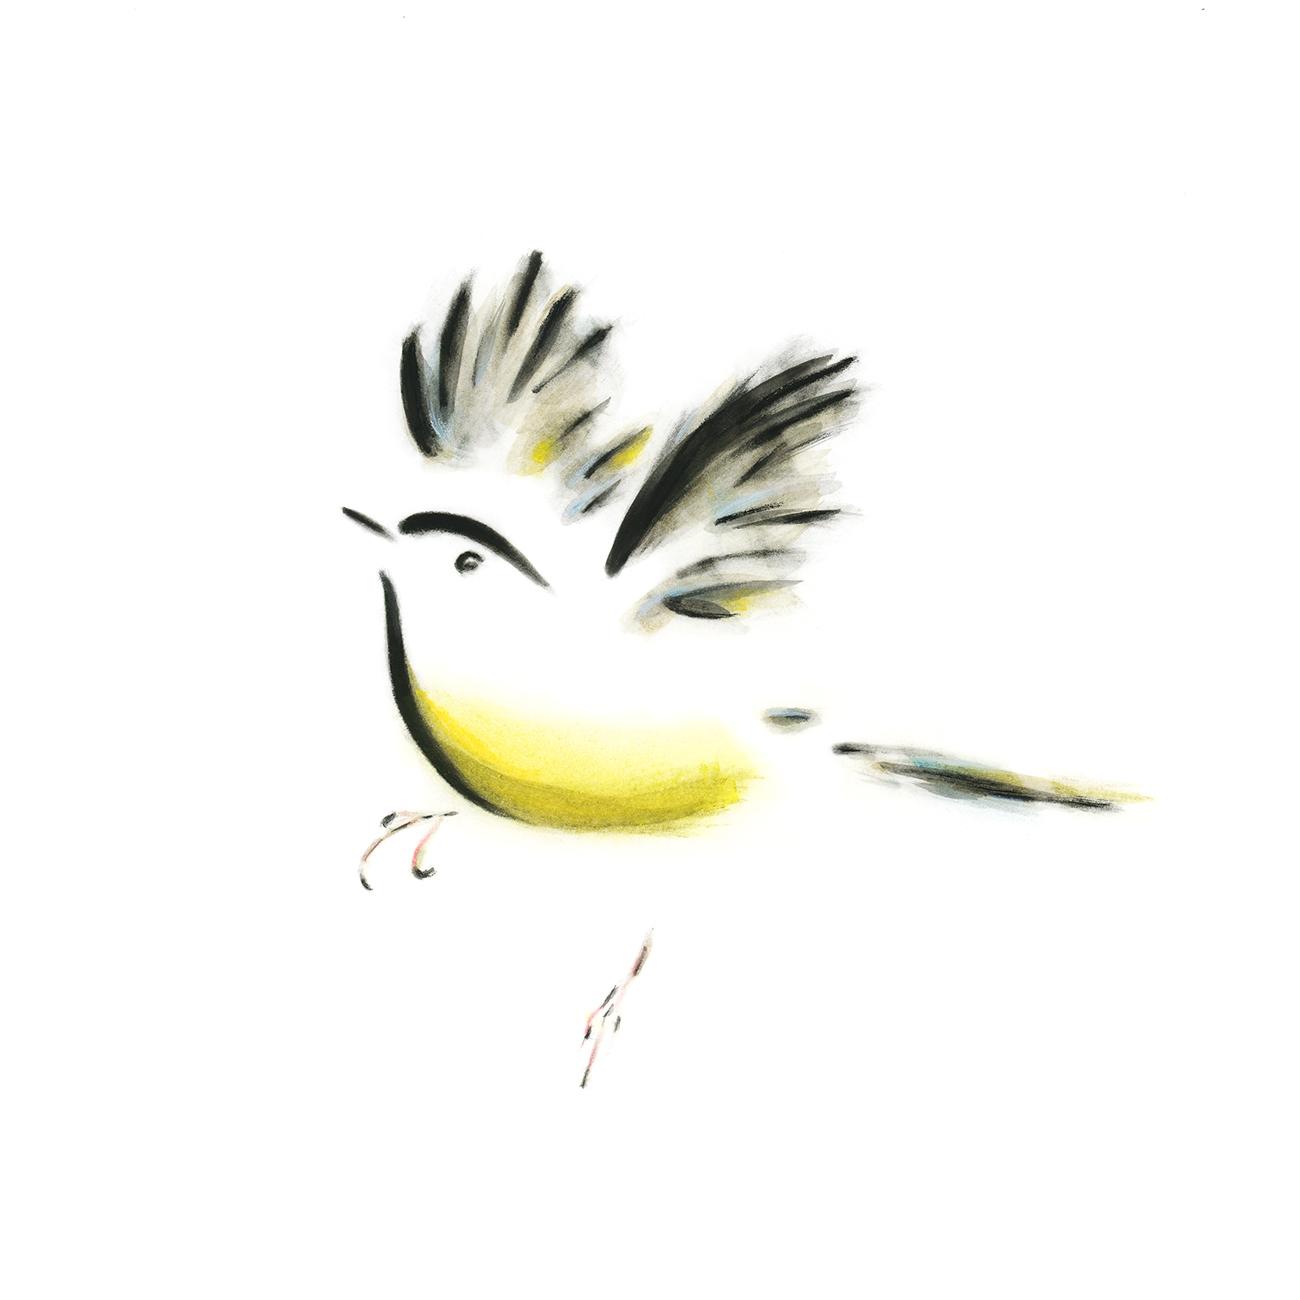 yellow_bird_seeds003_w.jpg